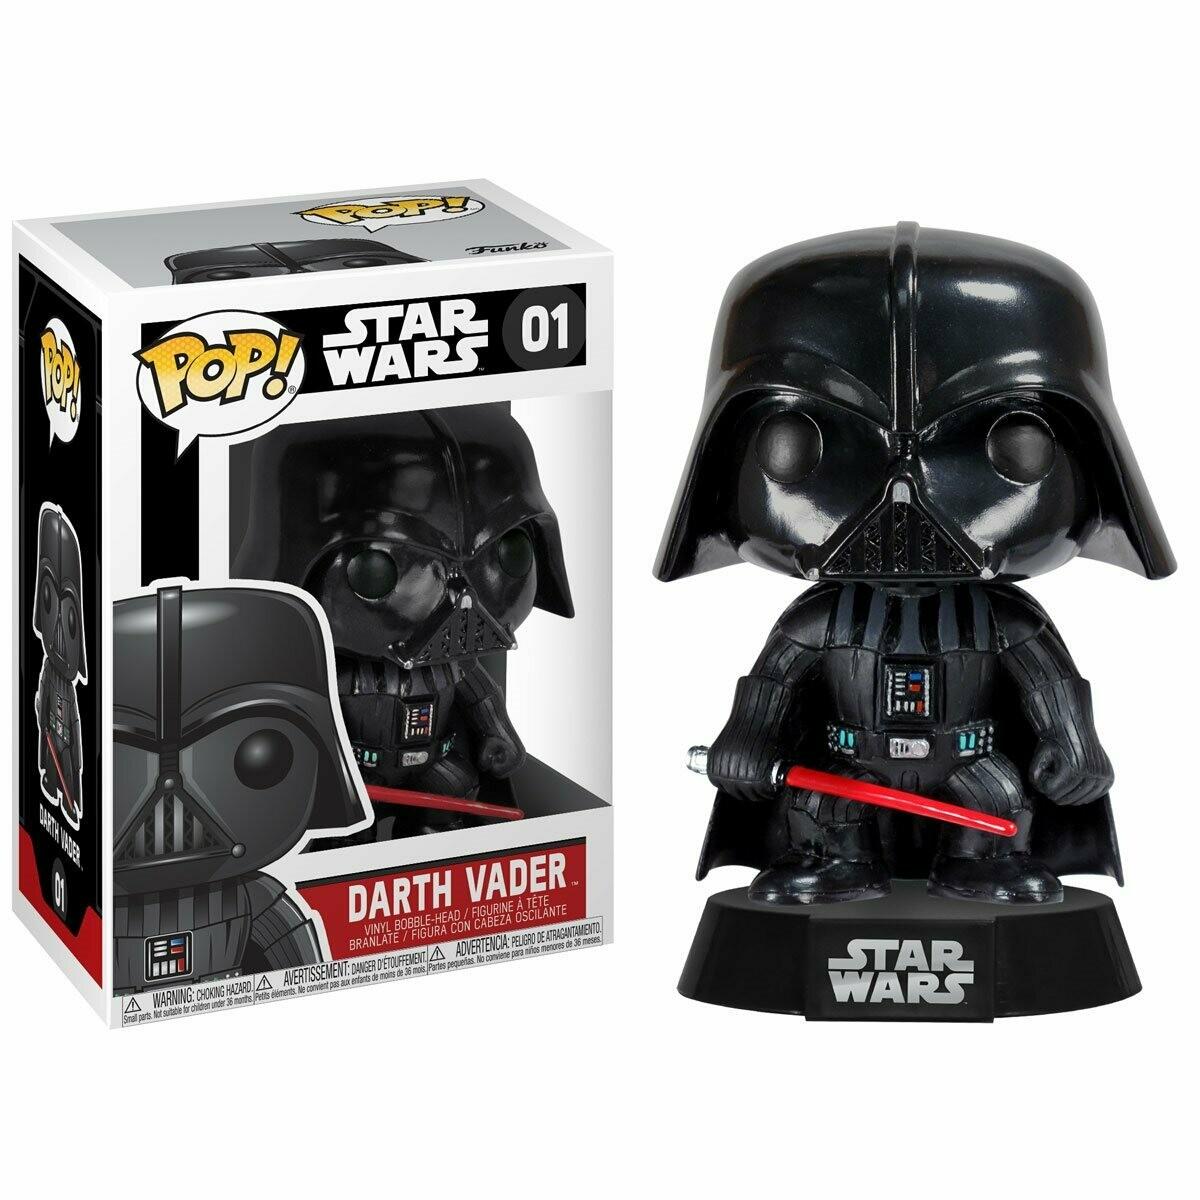 Funko Star Wars - Darth Vader 01 Pop! Vinyl Figure